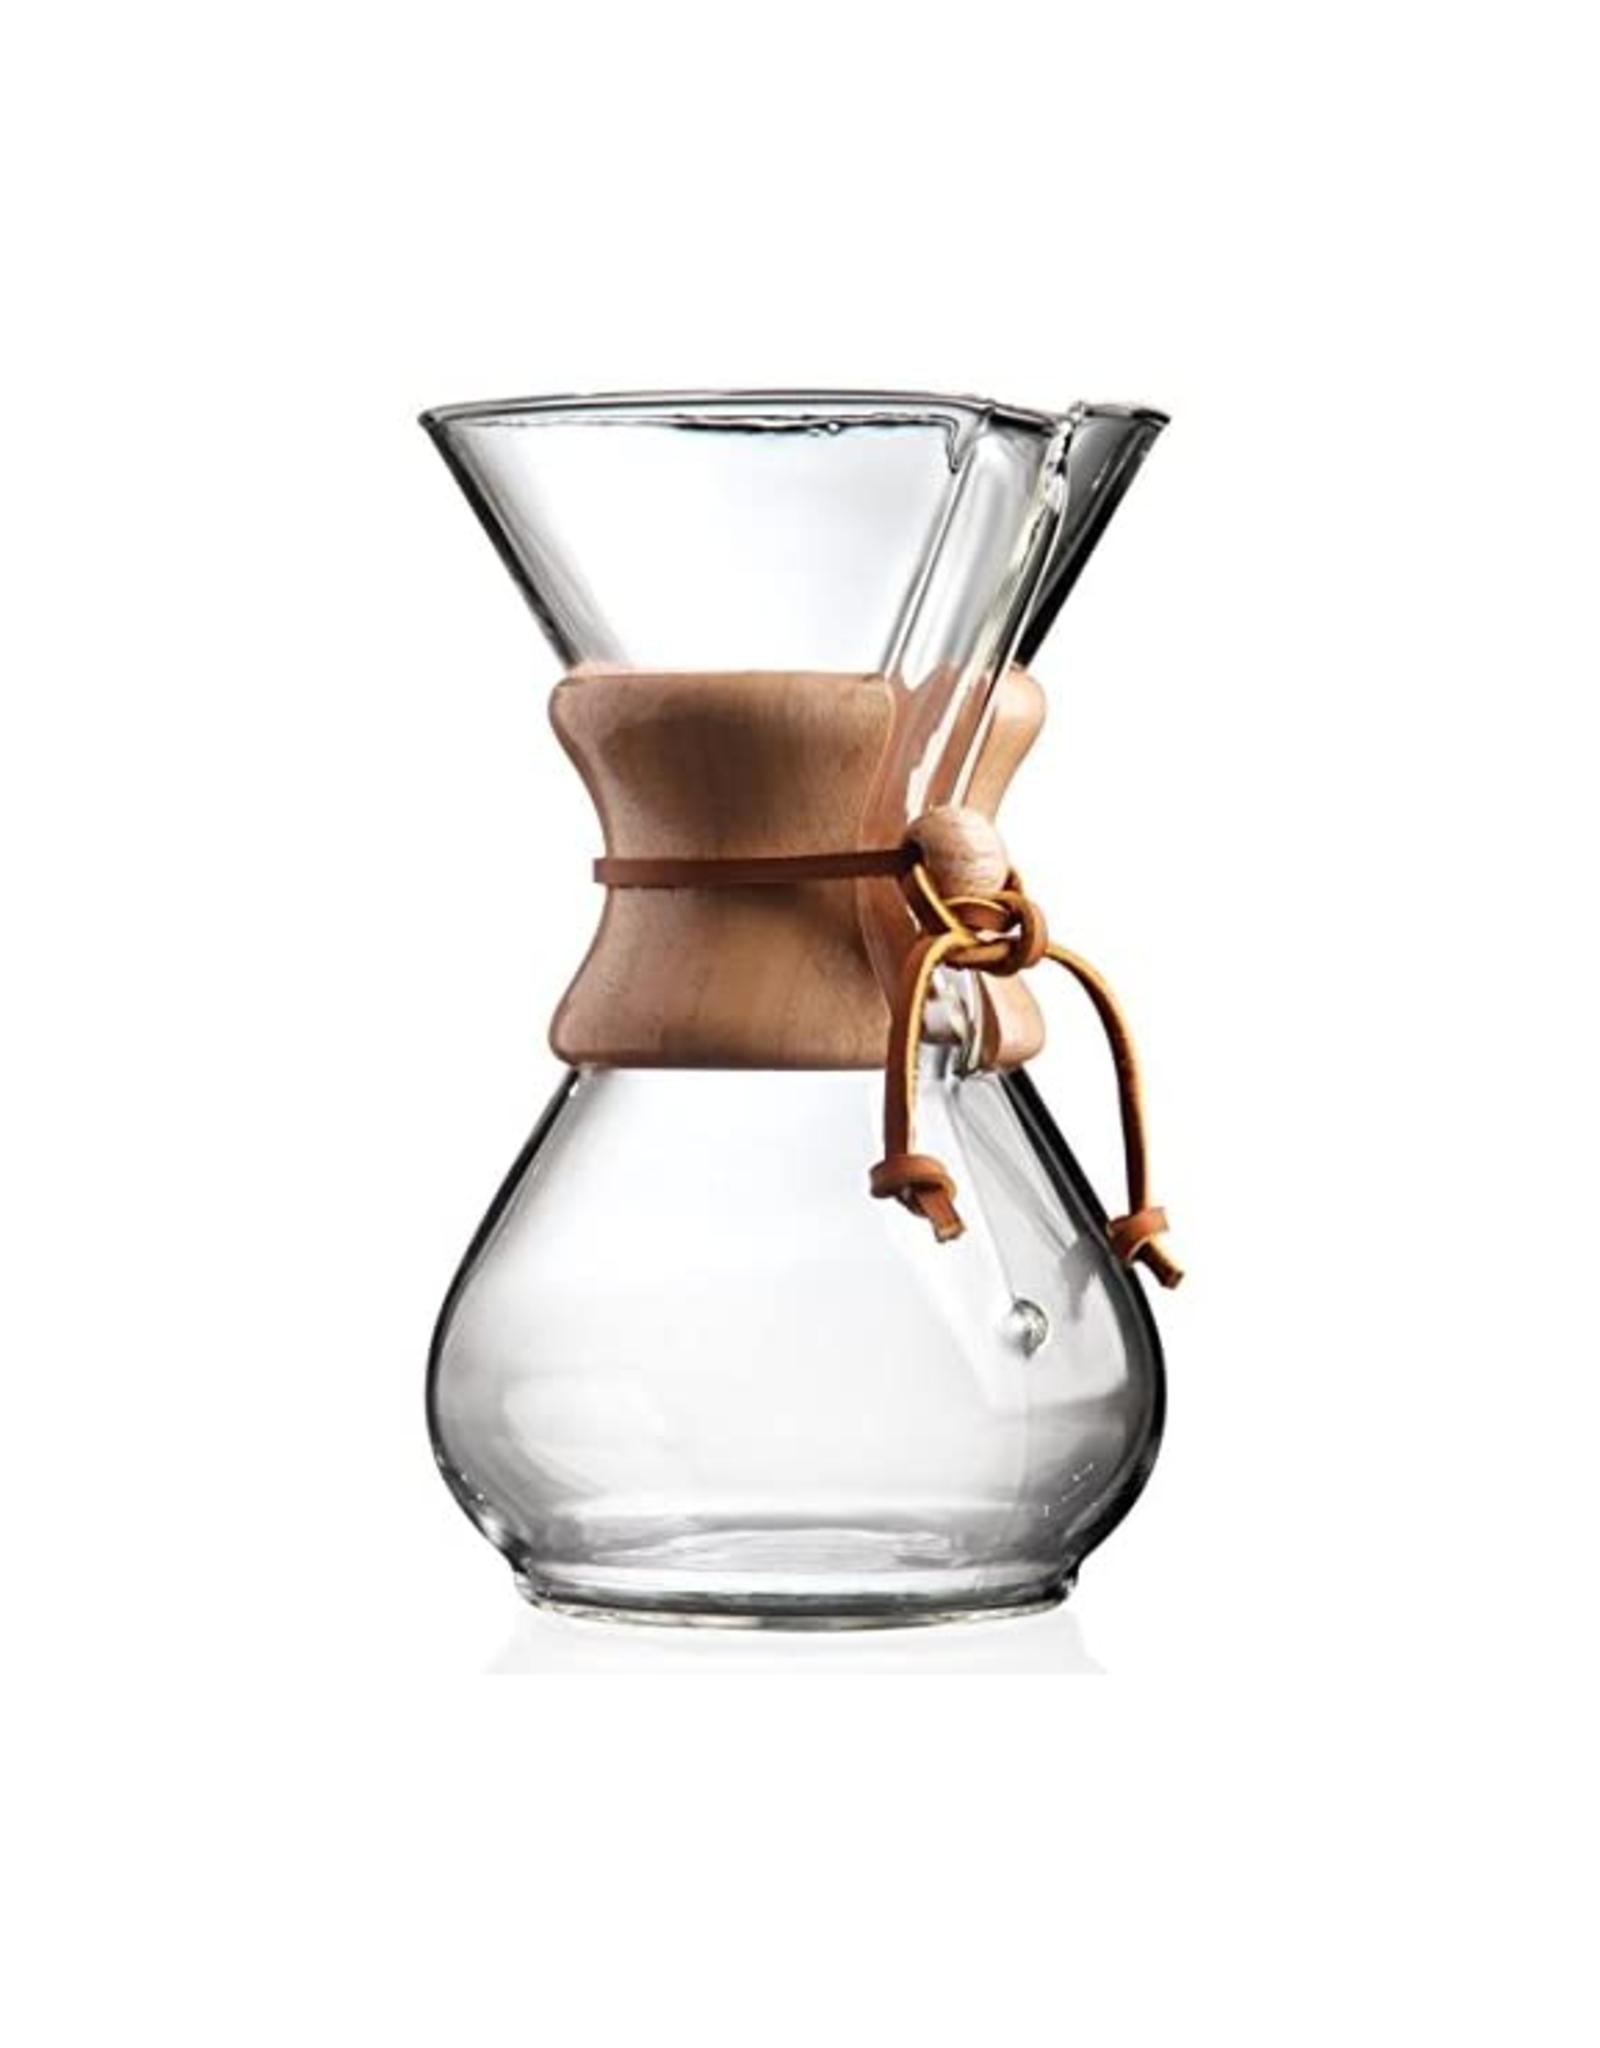 Chemex Chemex Glass Coffee Maker 6c. 30oz